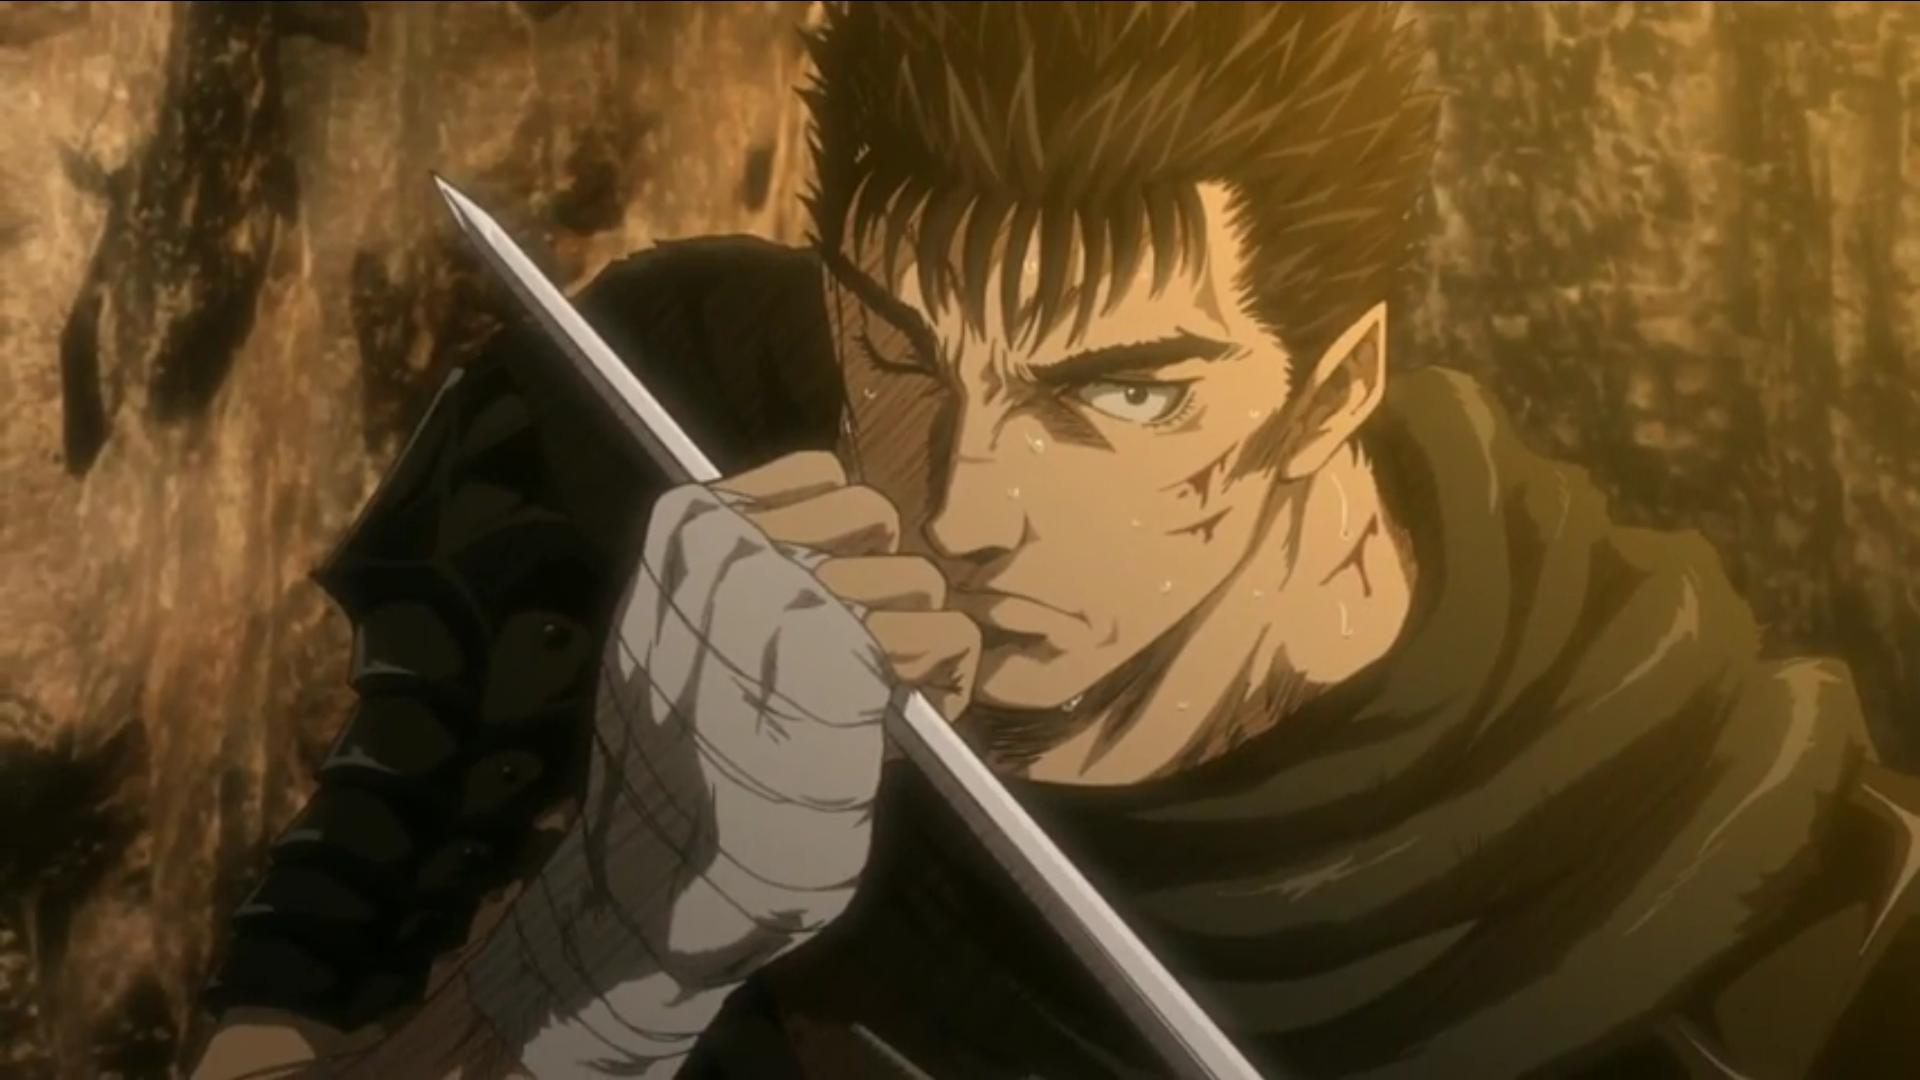 Anime Characters Like Guts : Berserk guts by dragonwarrior h on deviantart